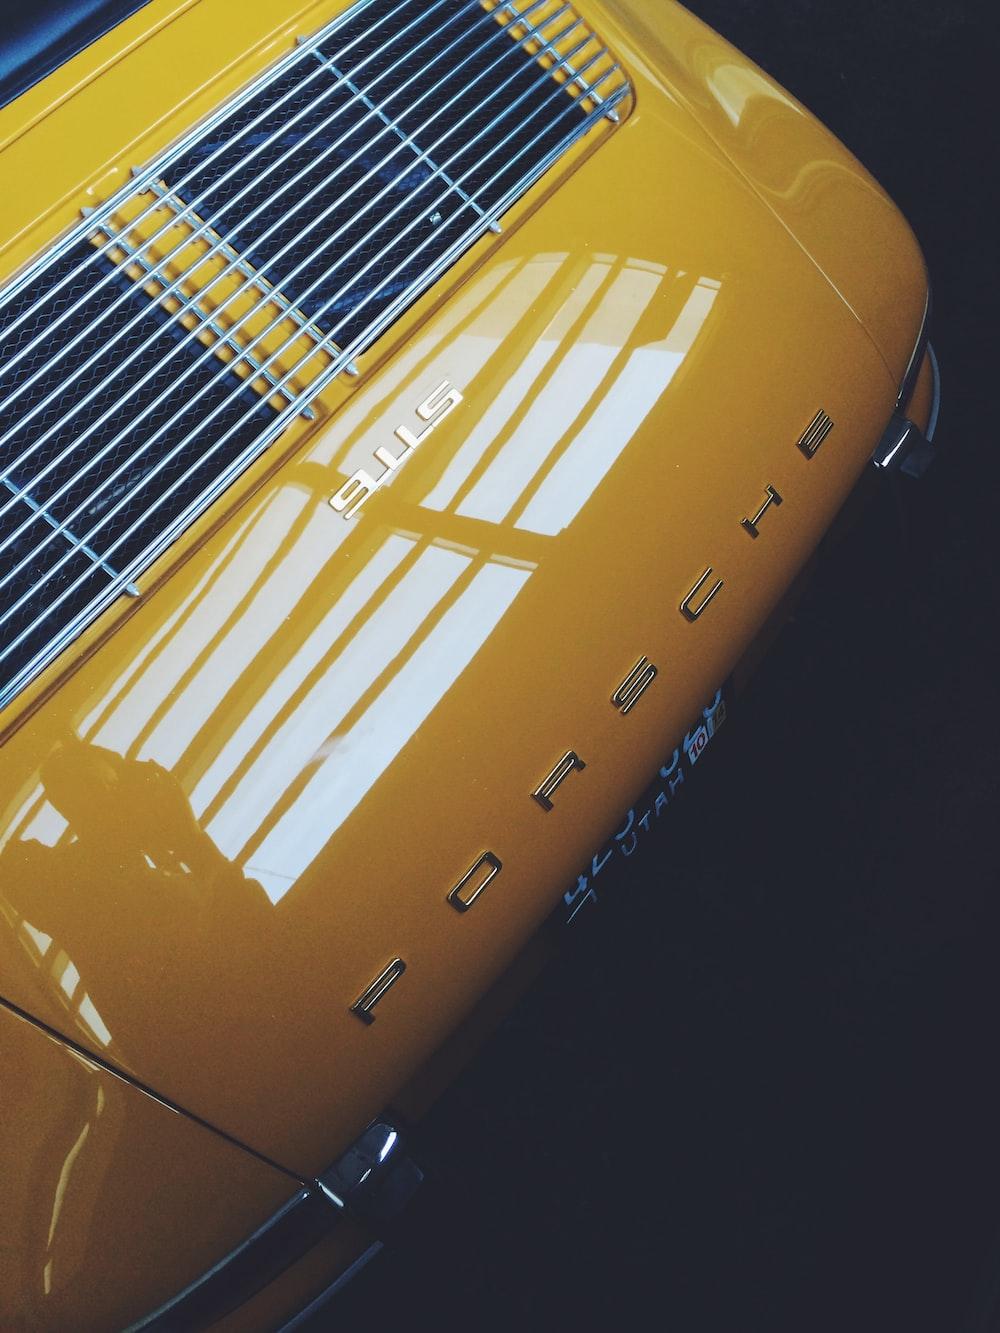 yellow and black Porsche vehicle